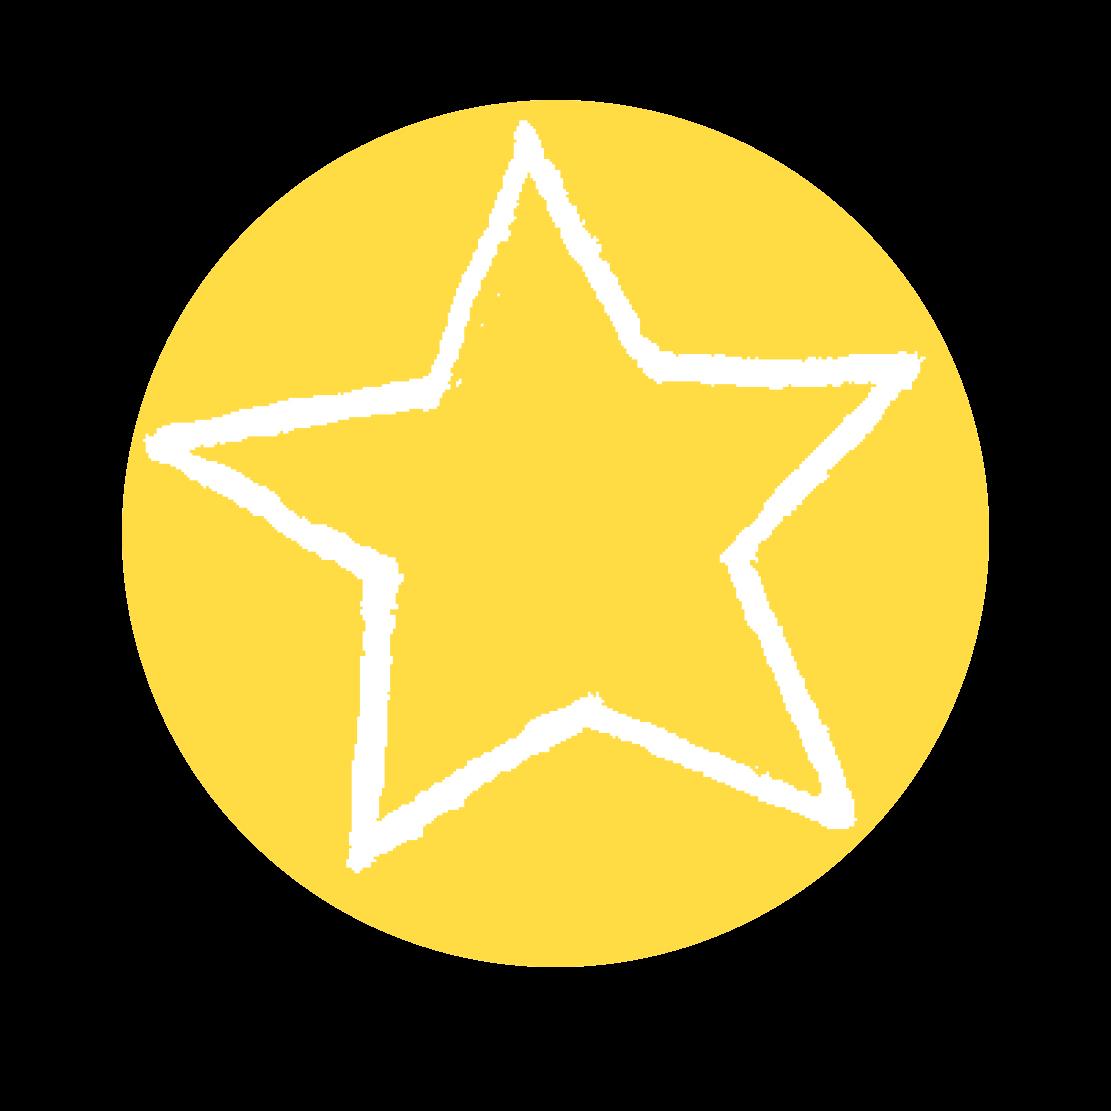 icons-xmas-stern-angelaholzmann.psd